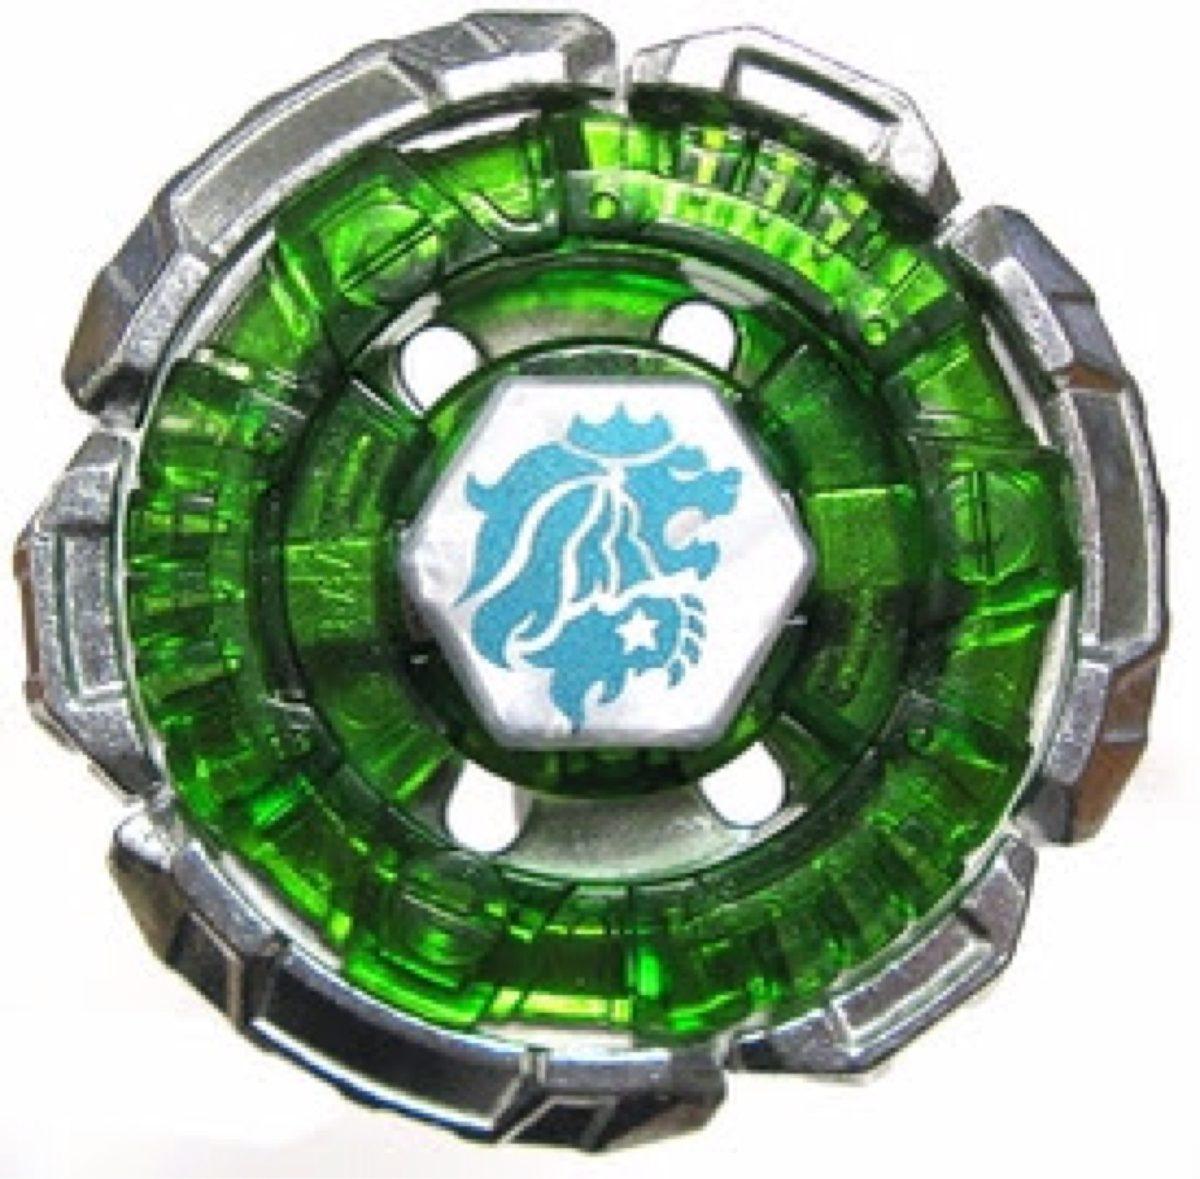 Fang leone beyblade metal fury de hasbro en oferta 99 - Beyblade metal fury 7 ...